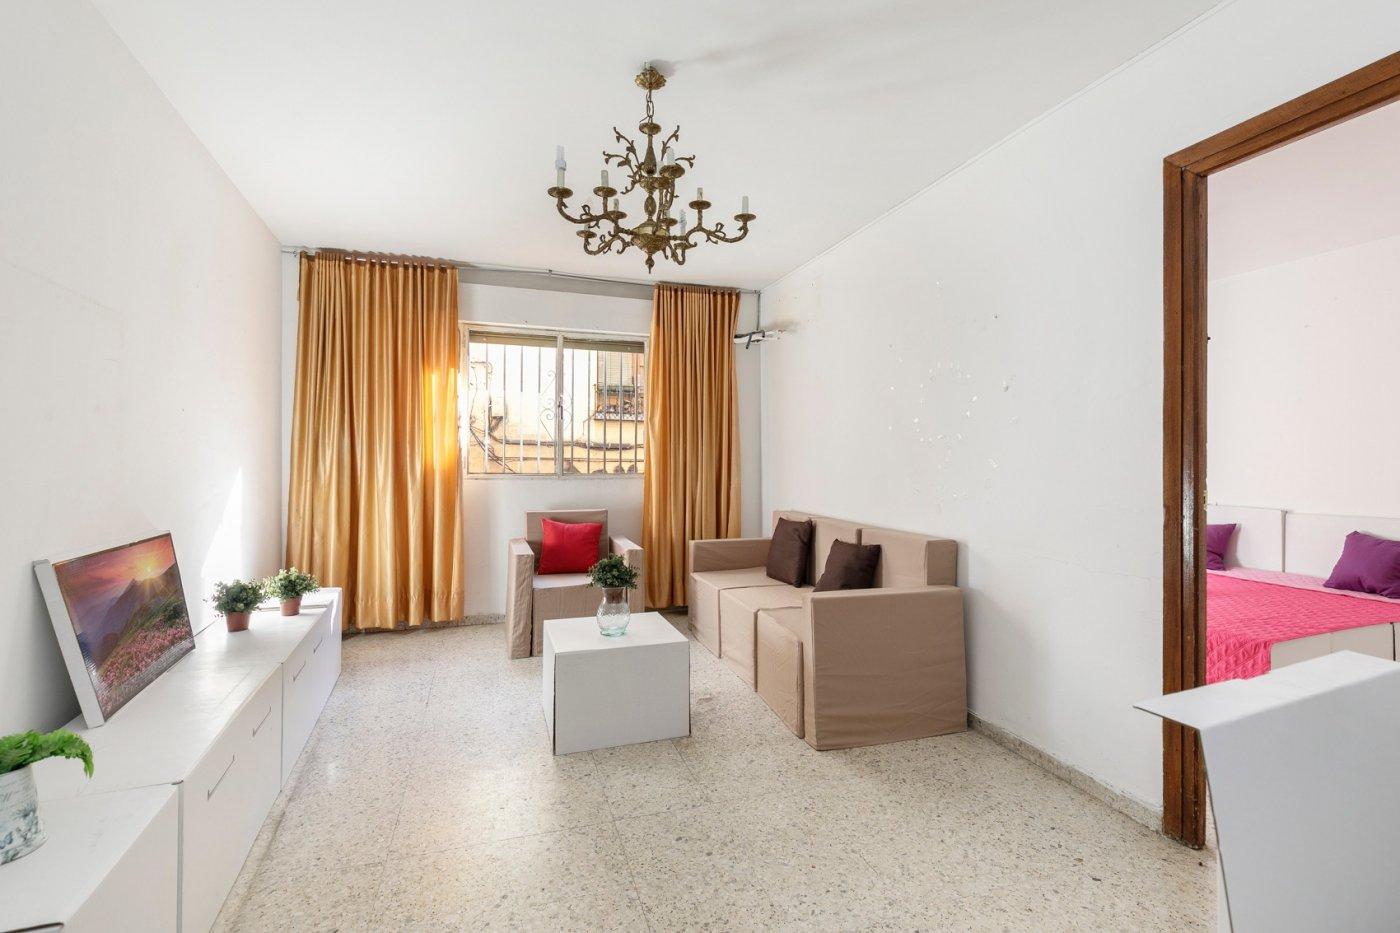 Estupendo piso para reformar a tu gusto